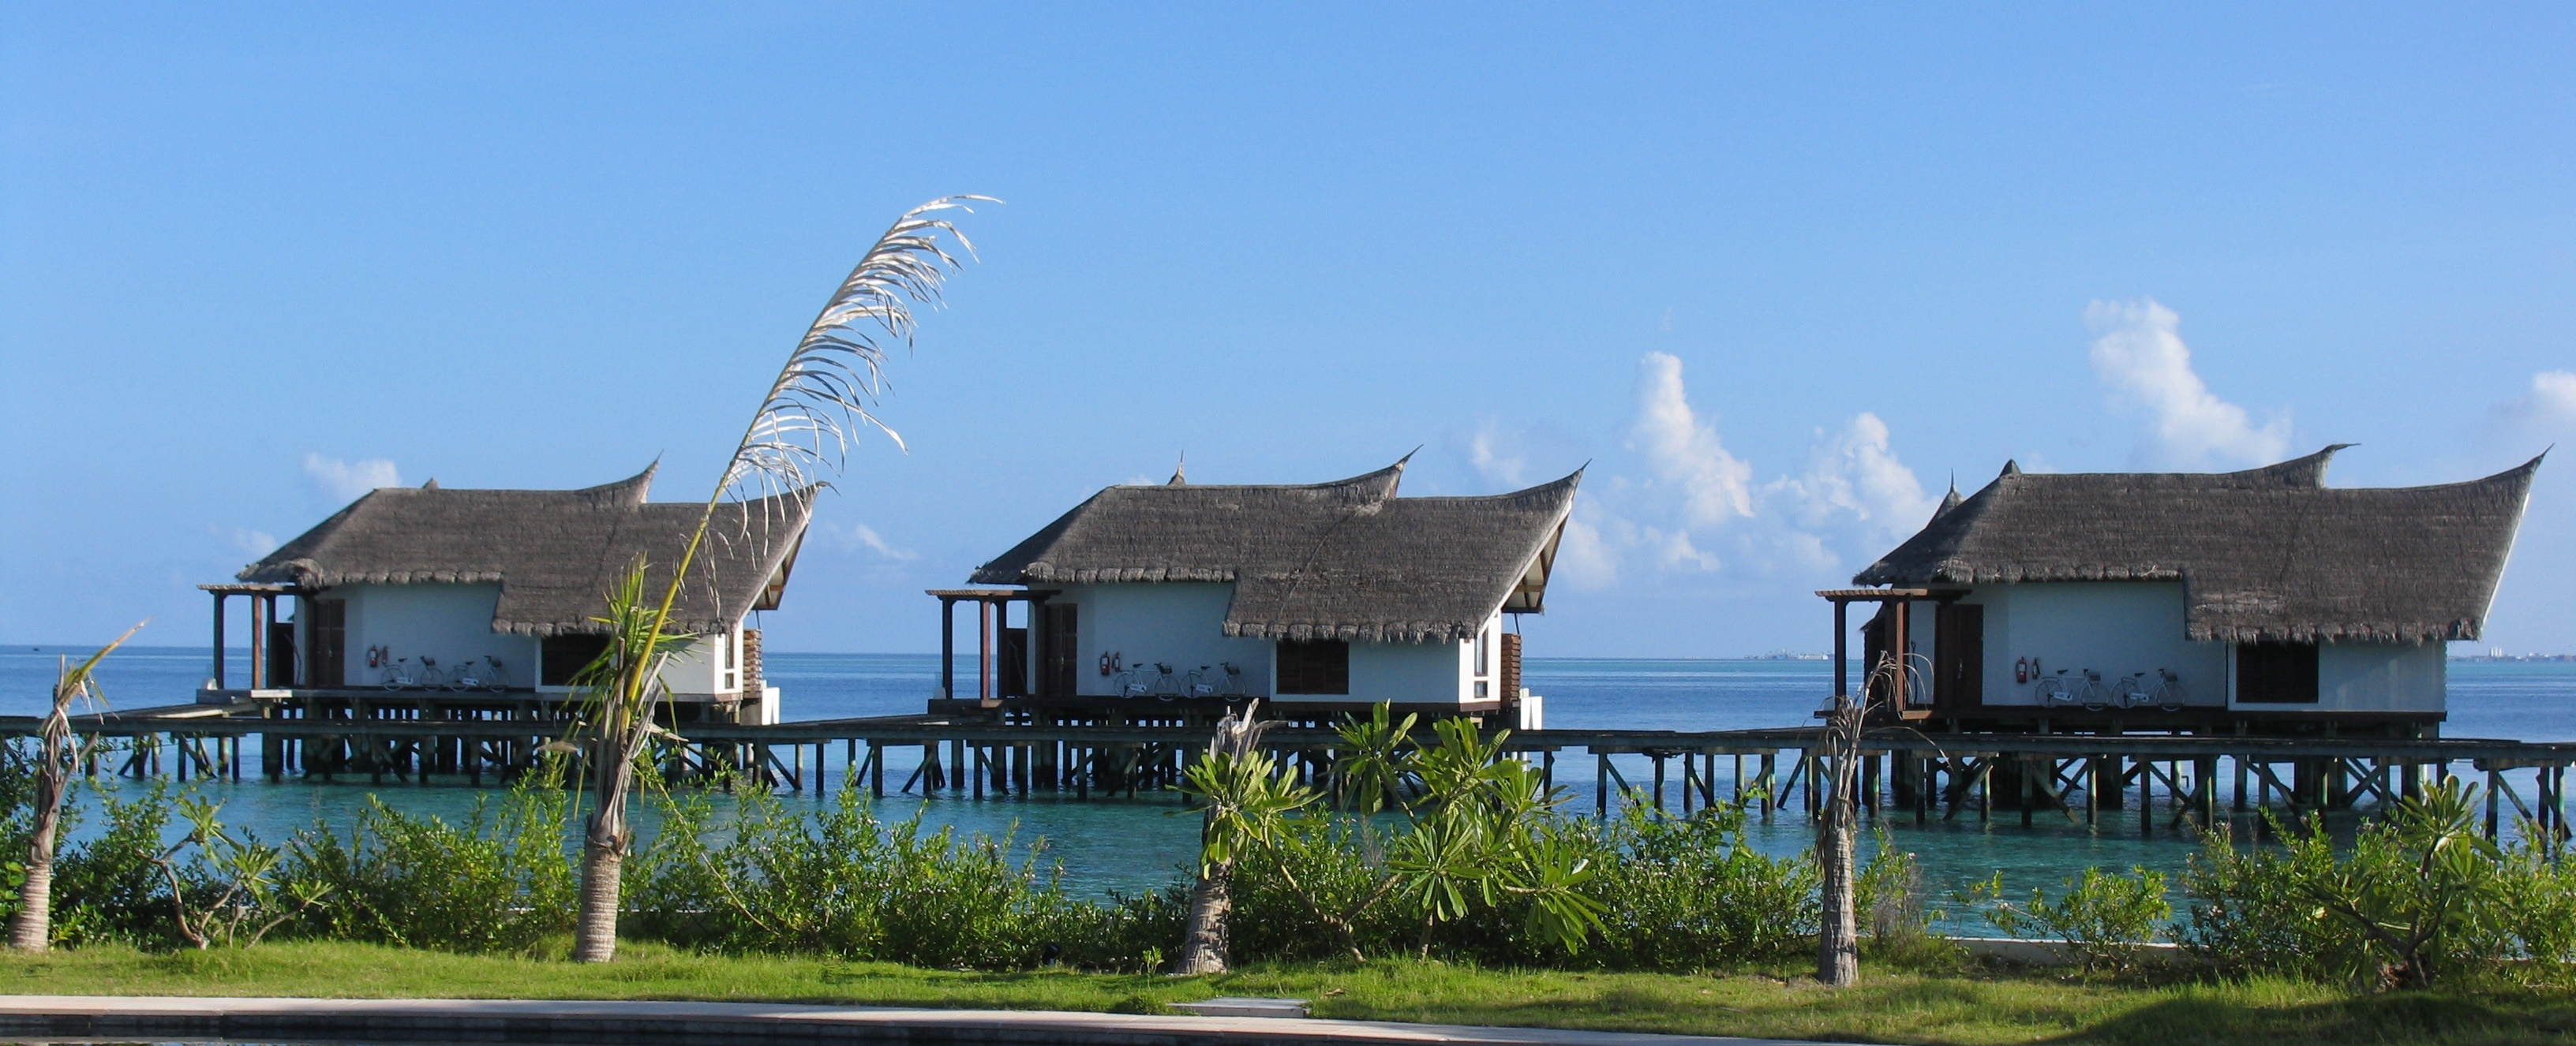 Malediven watervilla